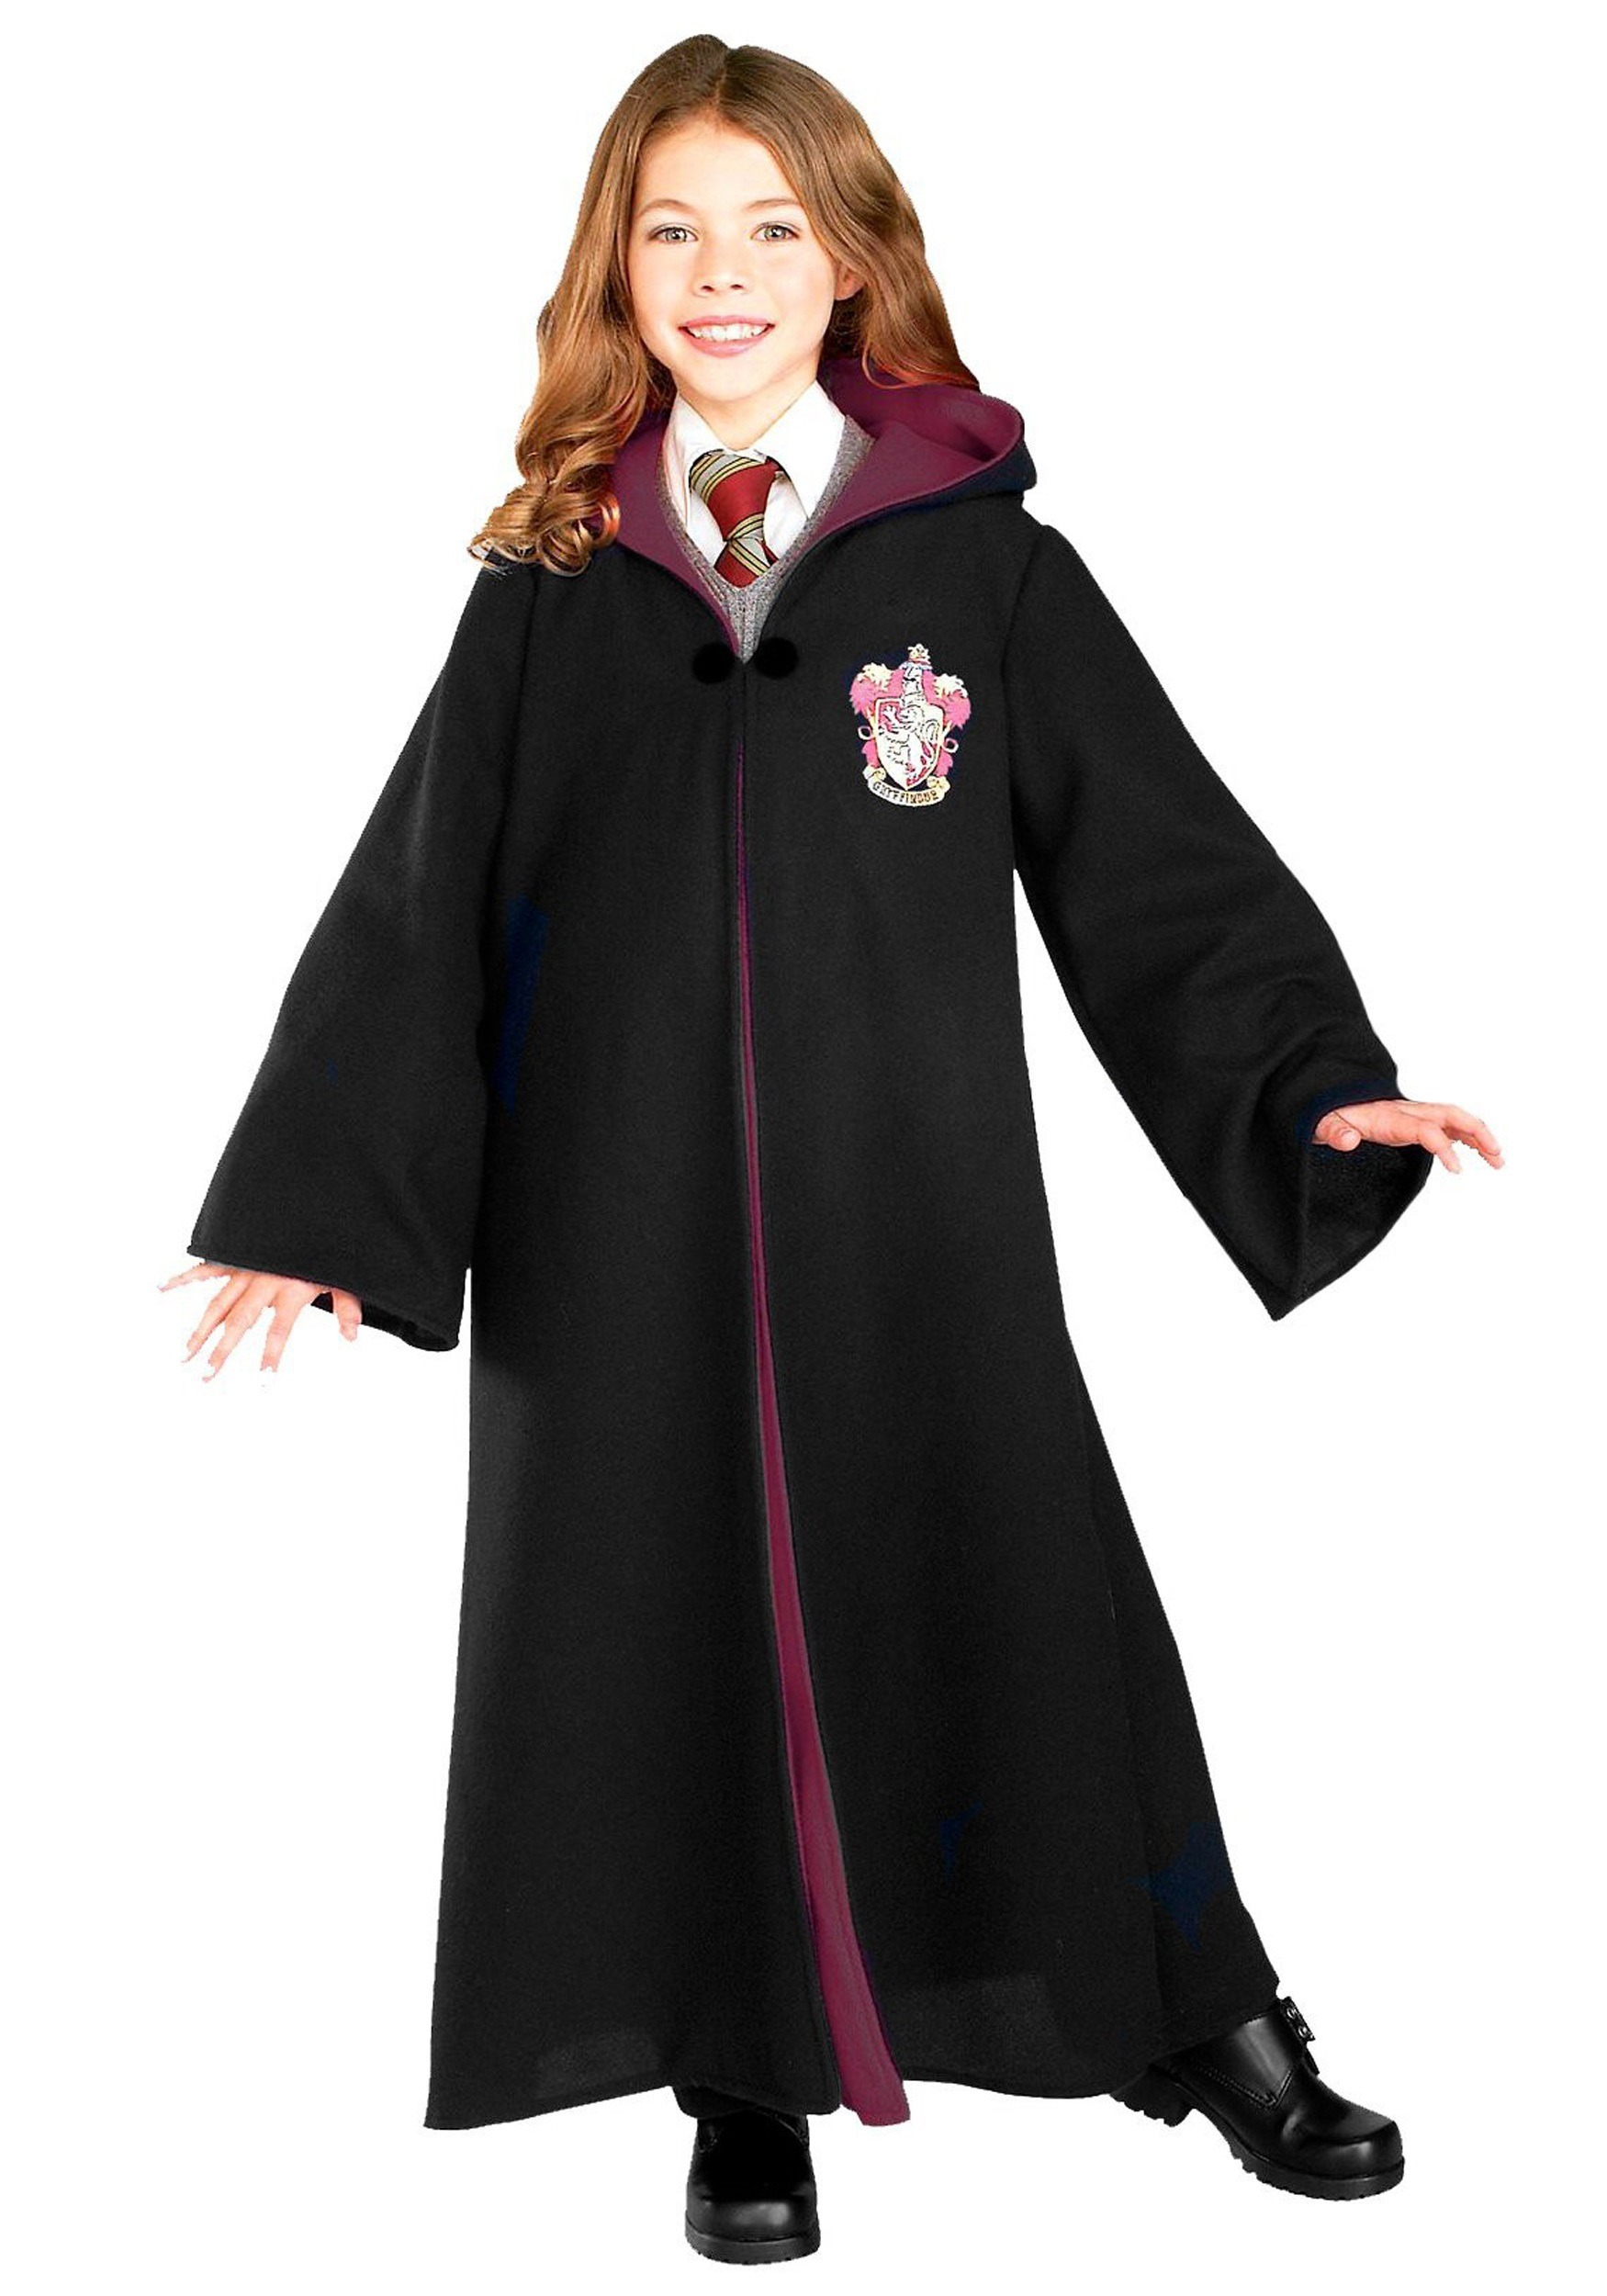 Child Deluxe Hermione Costume | Wizard Costume